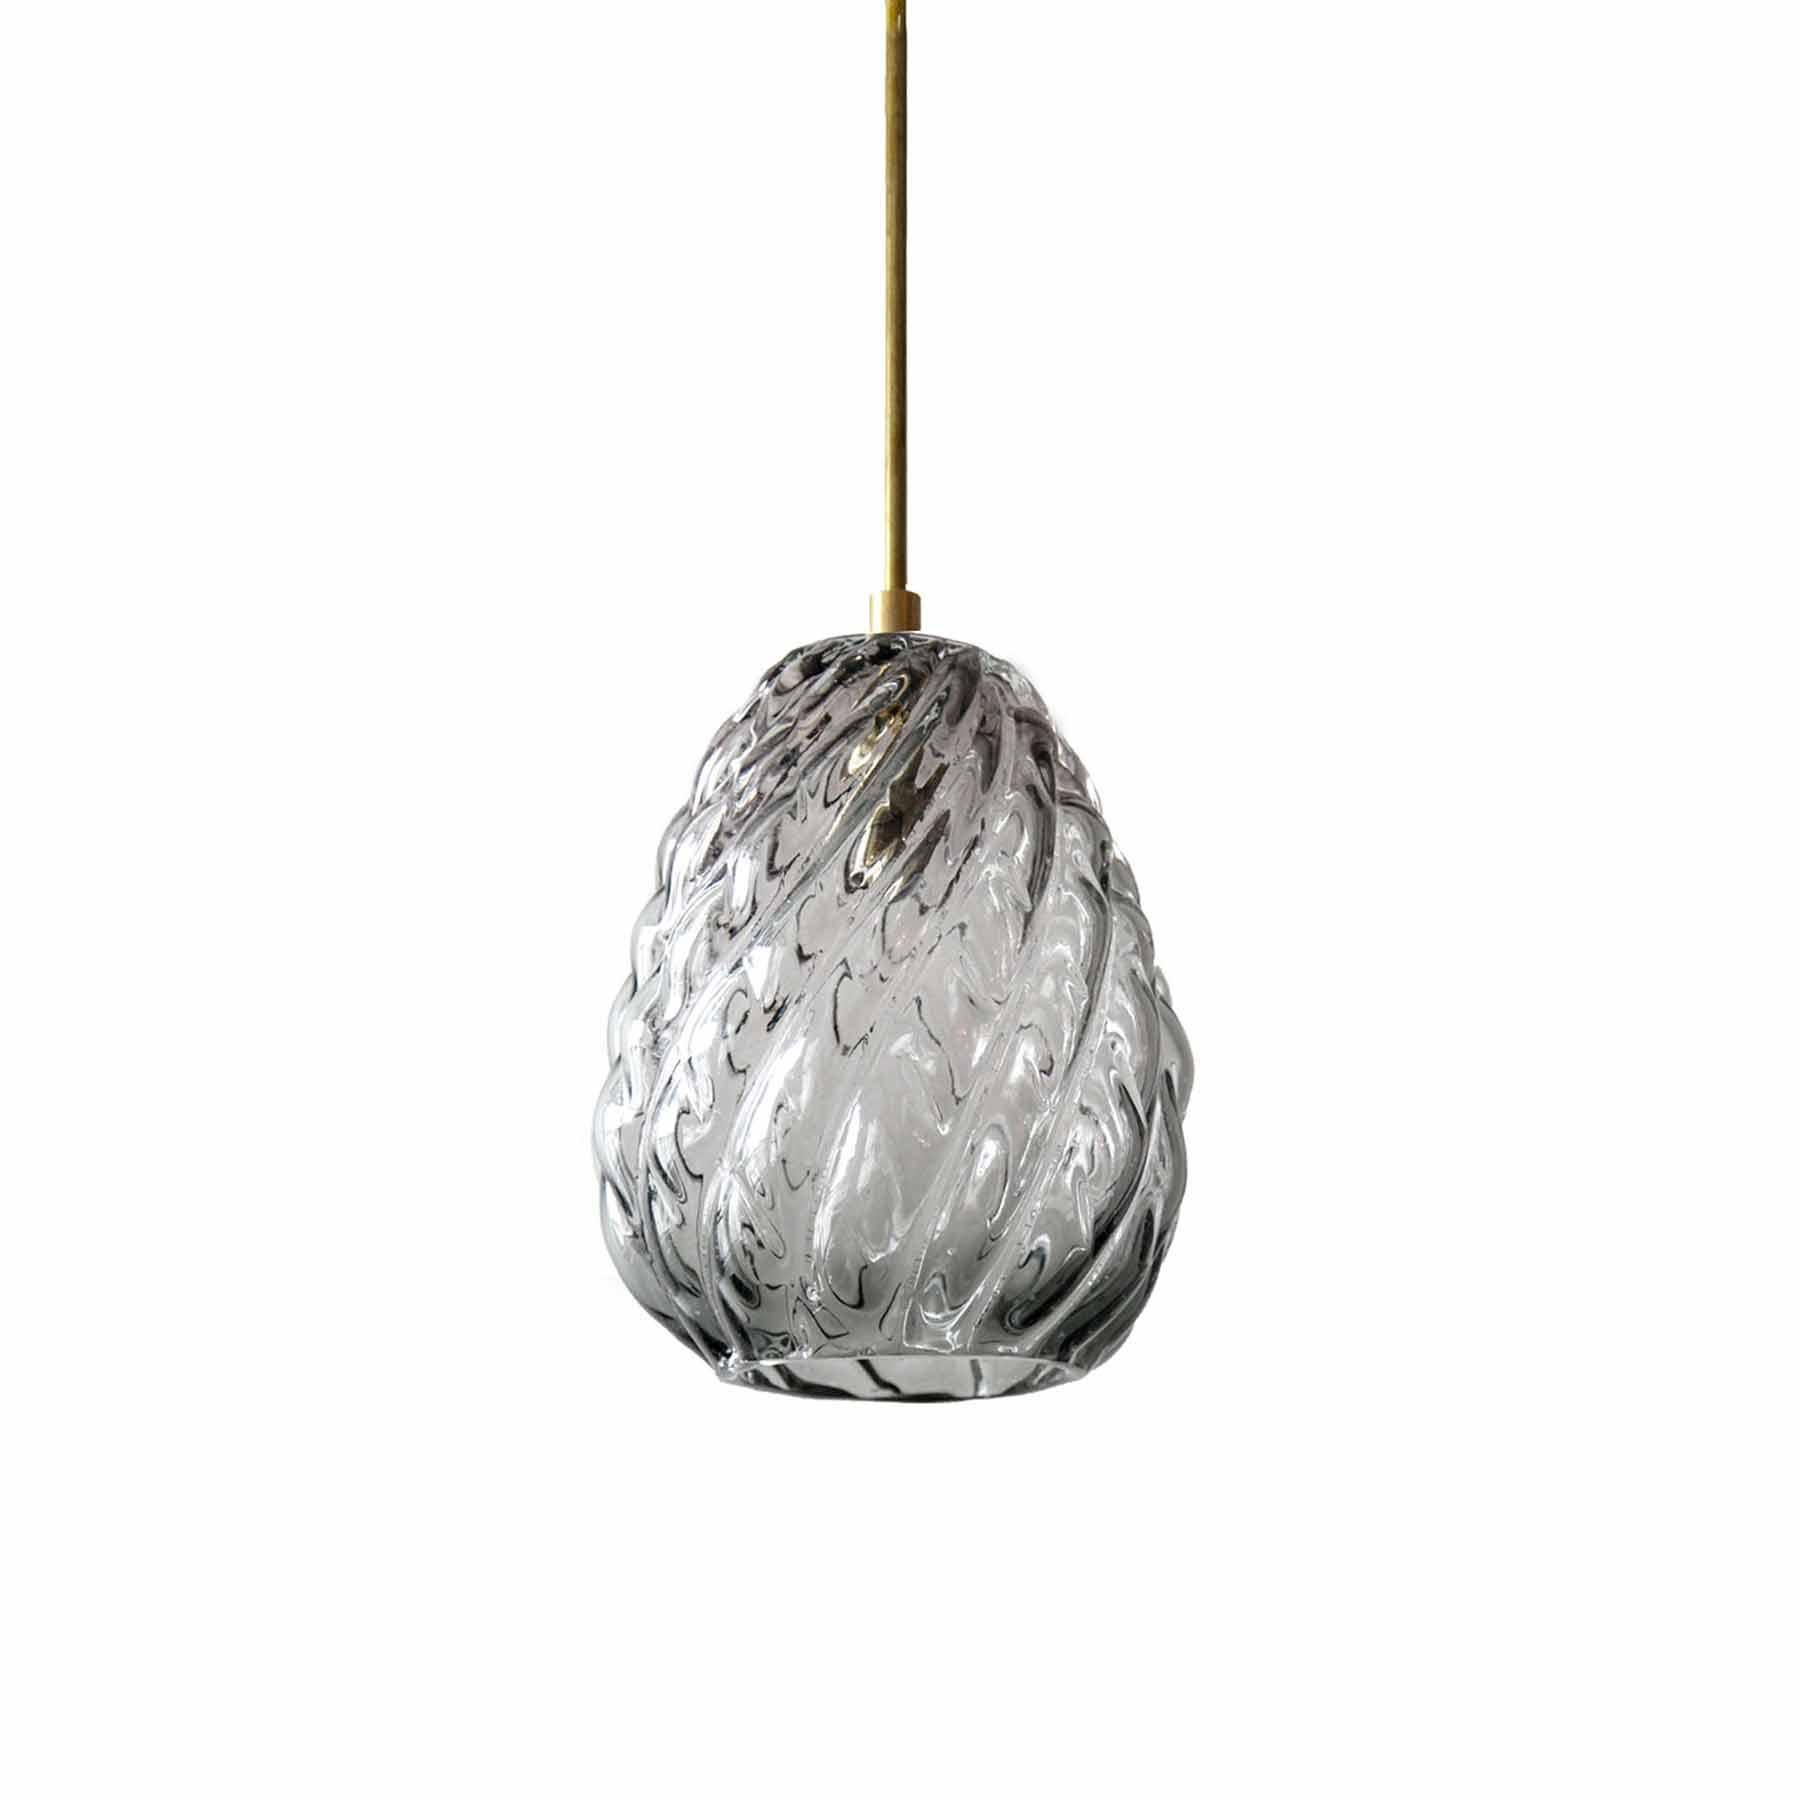 Handblown Glass Pendant, Smoke Glass, Tobalà, Agave Lighting Collection